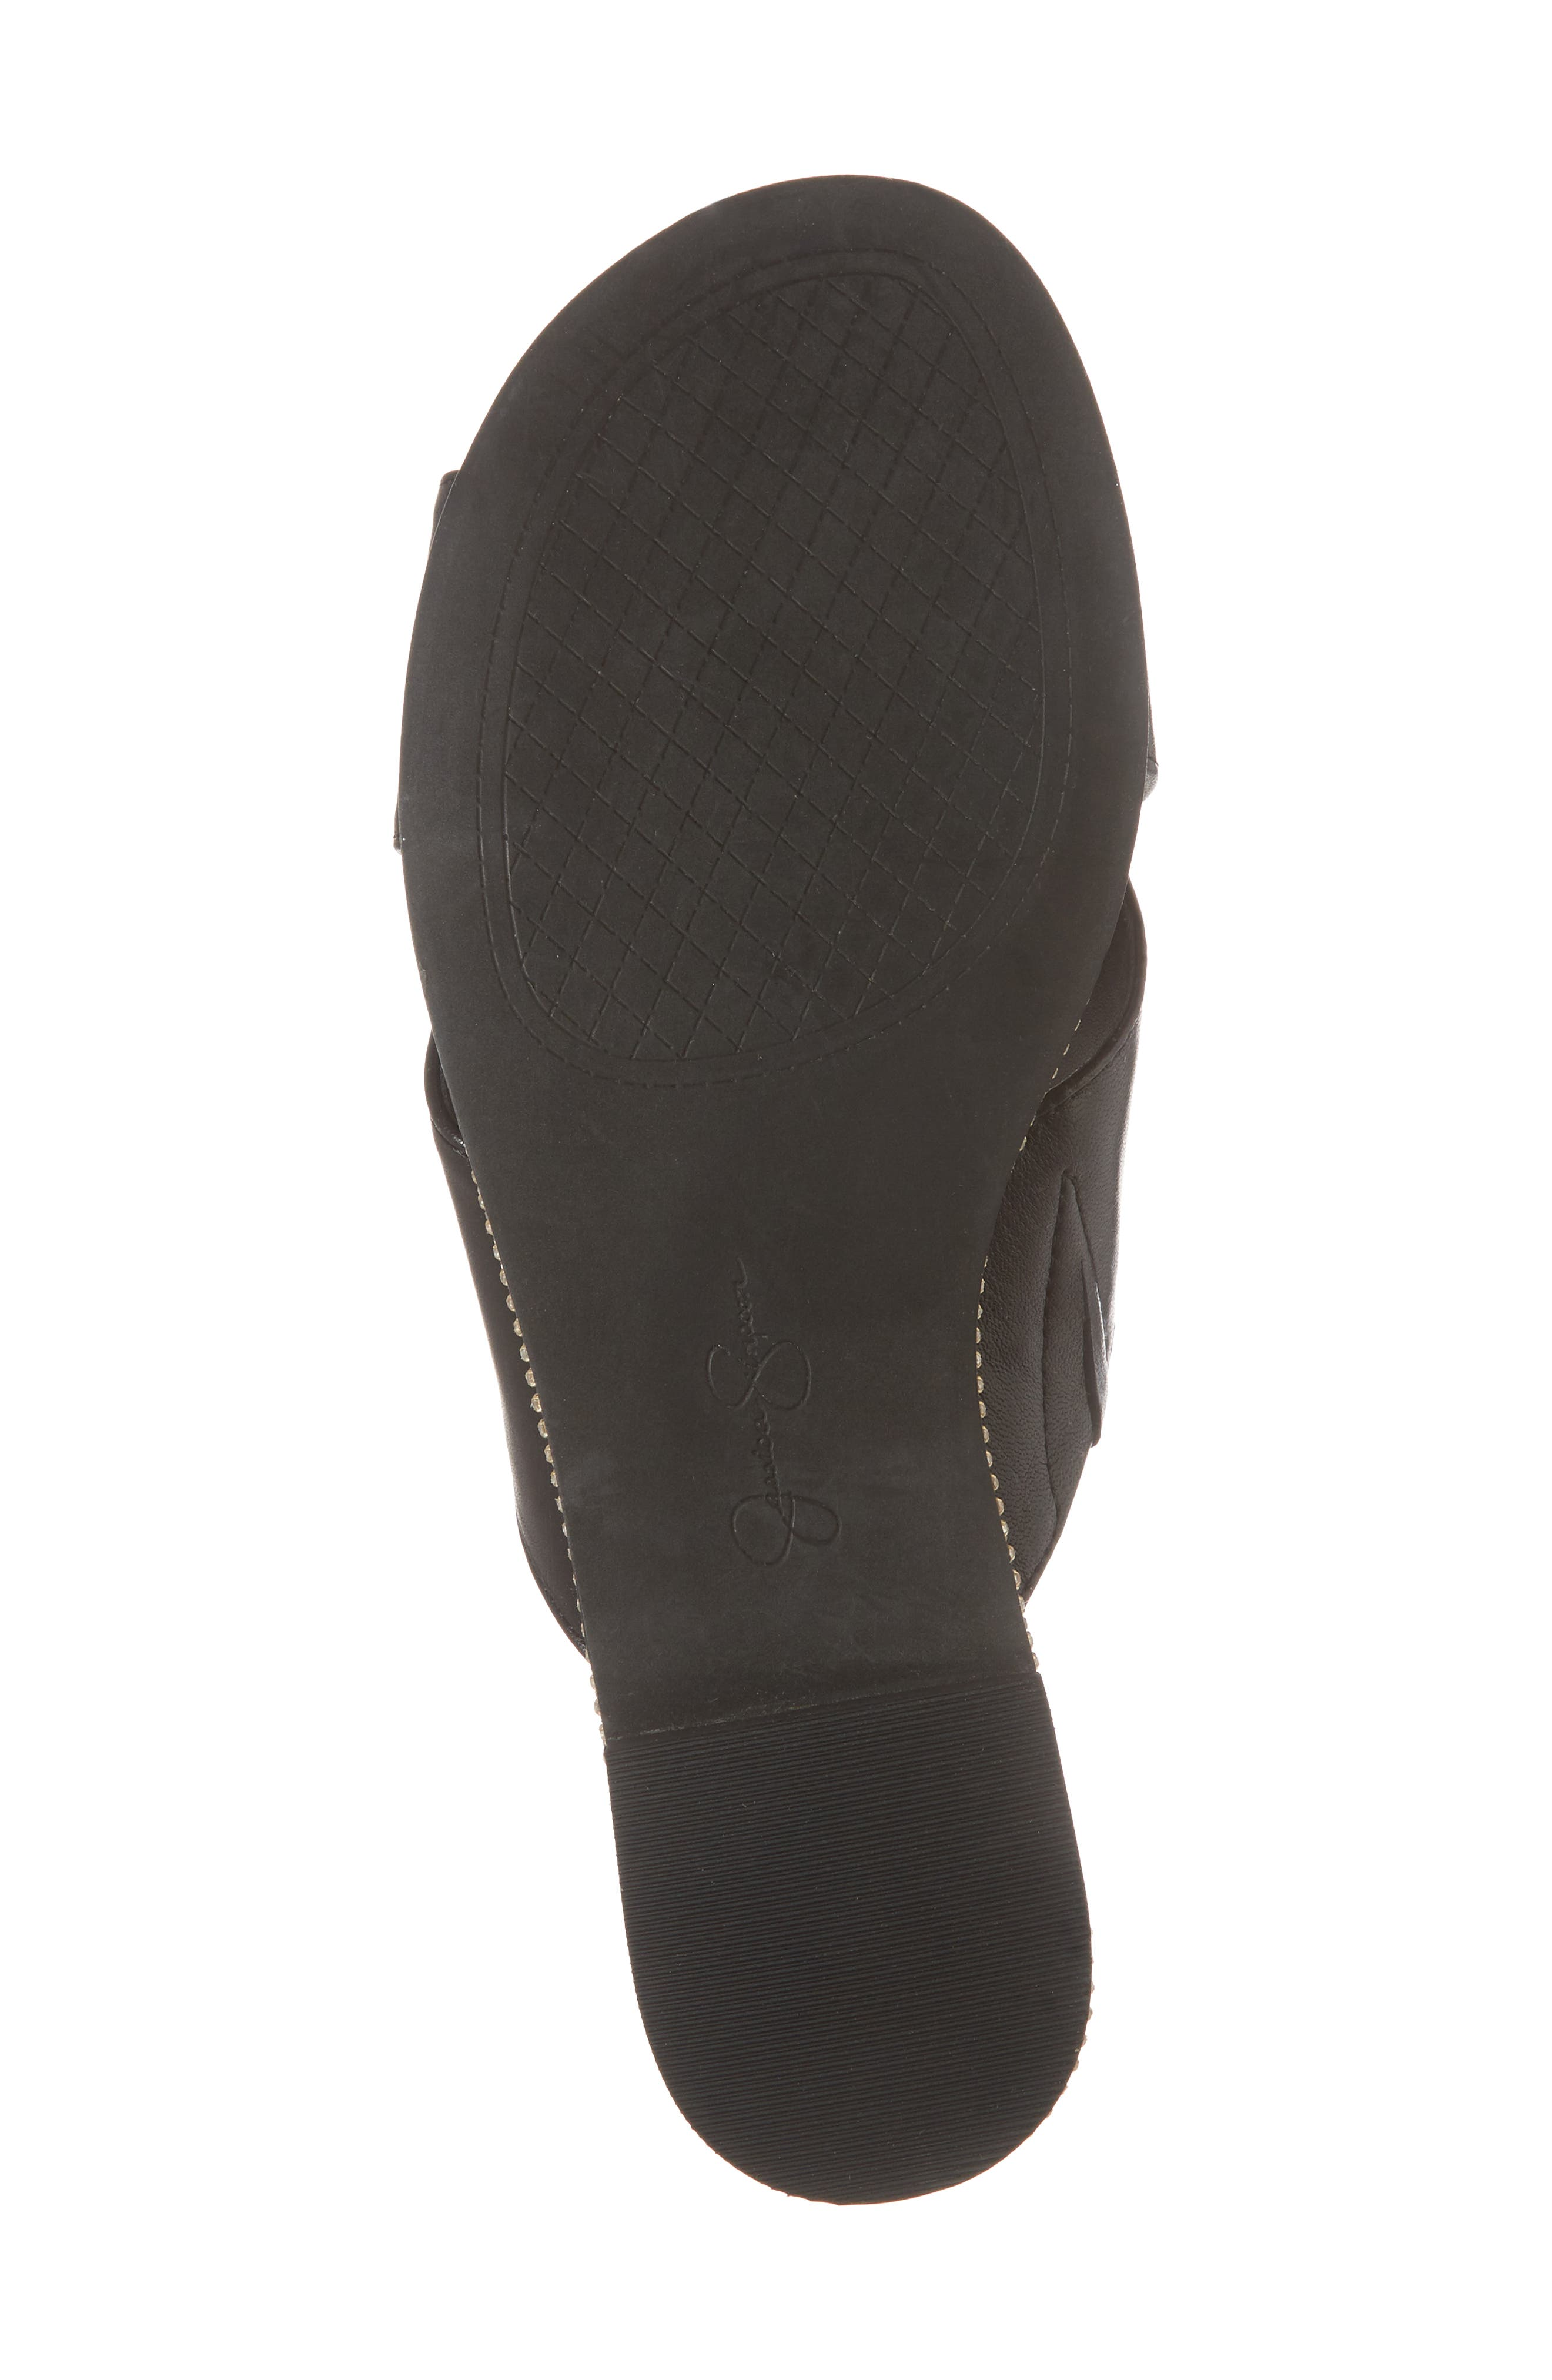 Brinella Sandal,                             Alternate thumbnail 6, color,                             Black